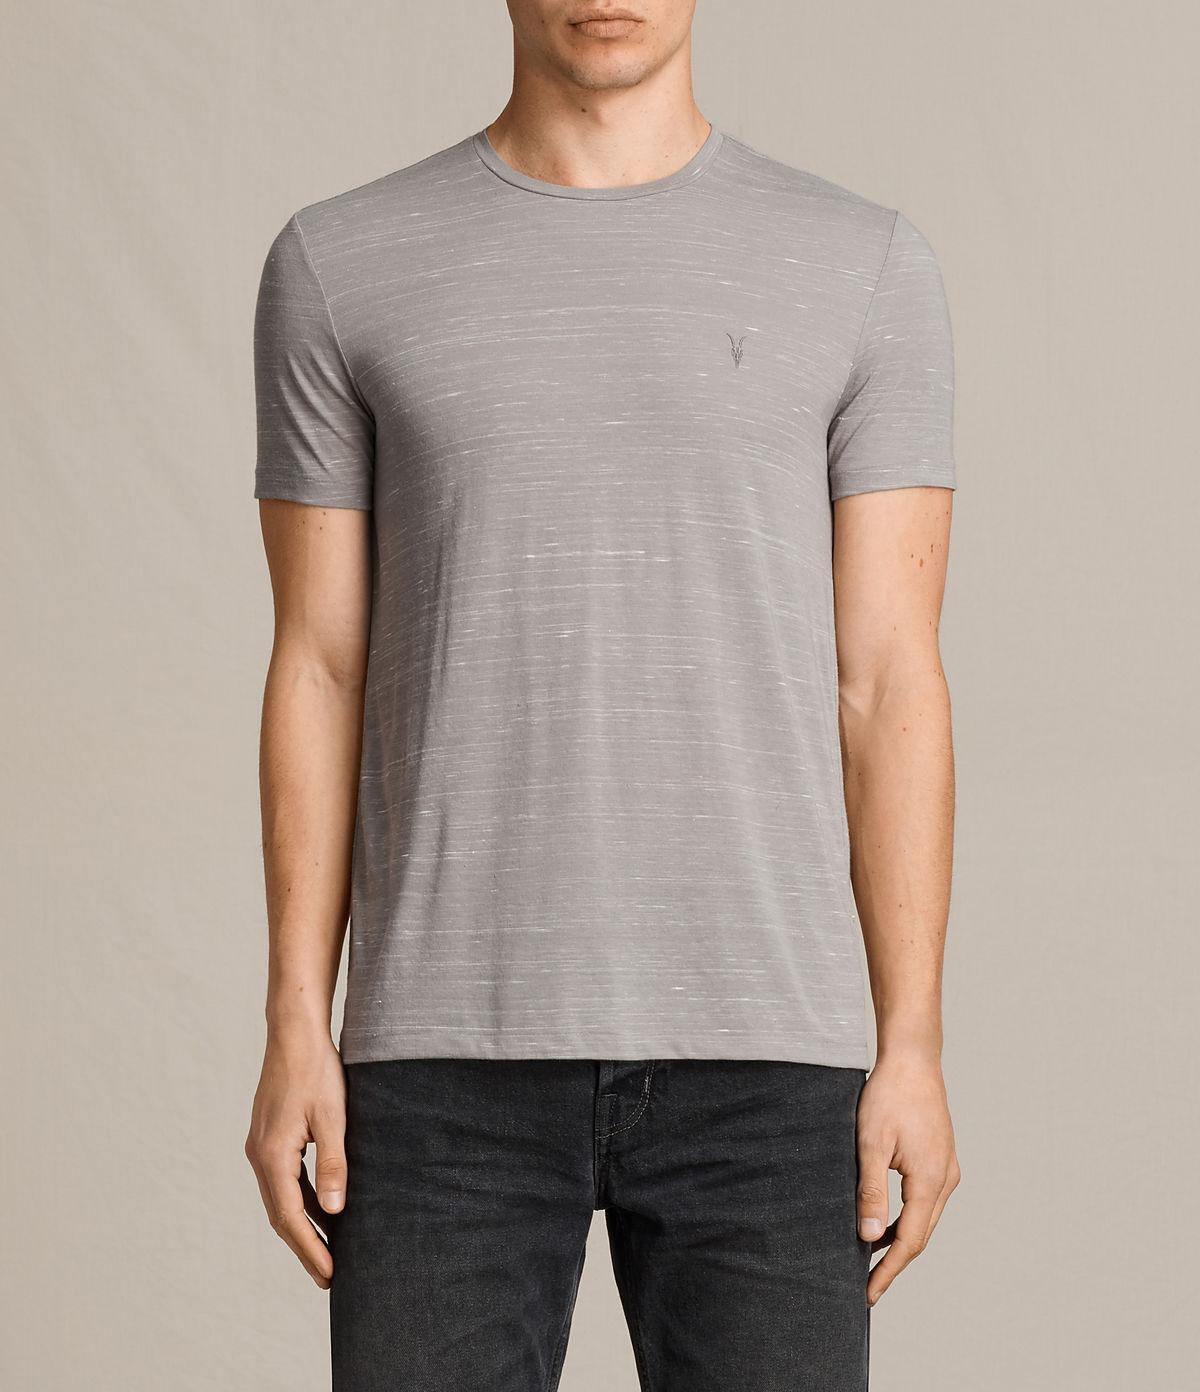 stanley-crew-t-shirt